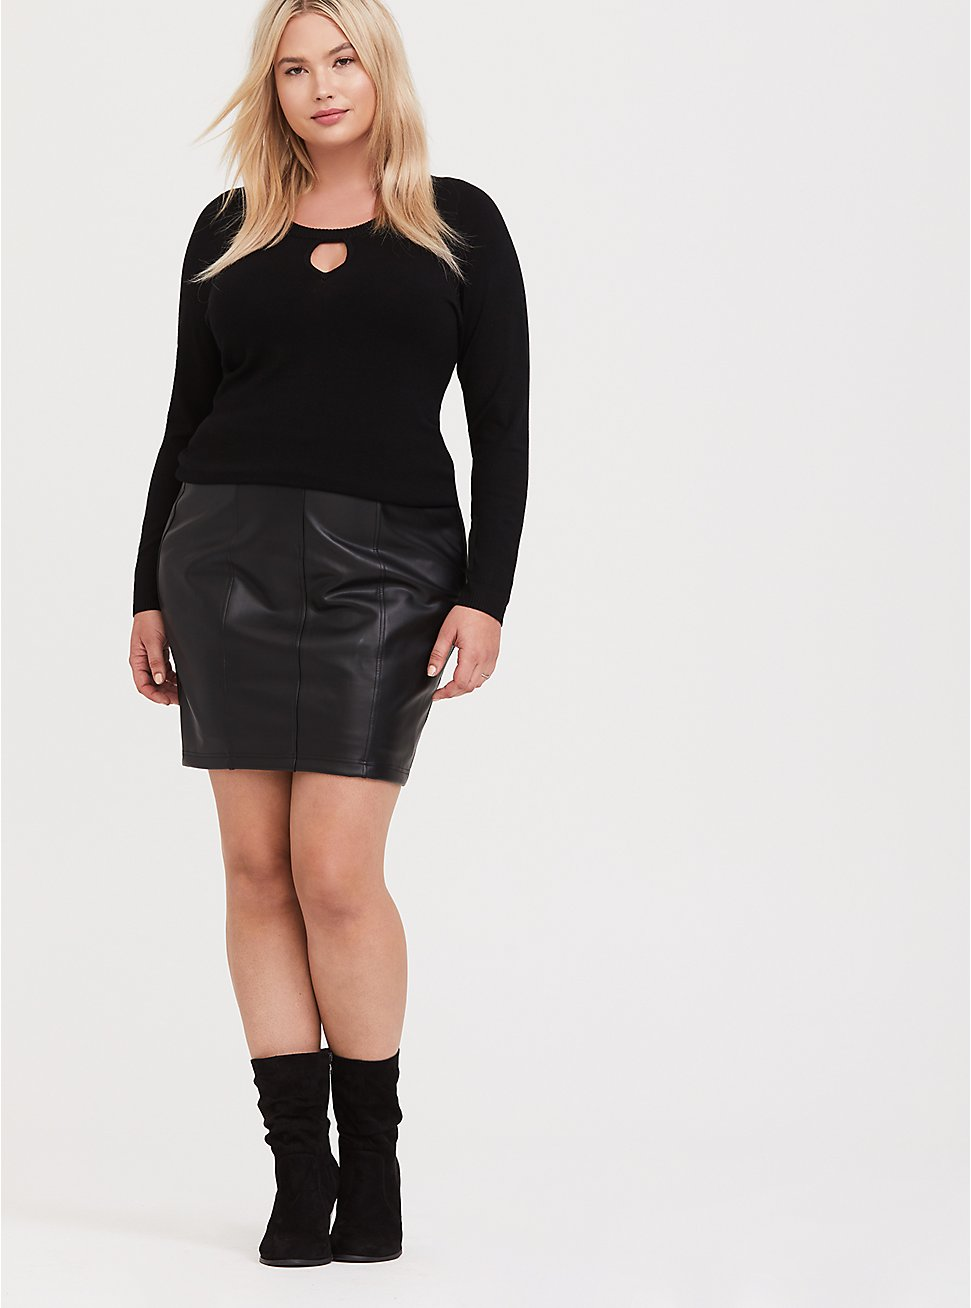 Plus Size Black Sweater-Knit Keyhole Top, DEEP BLACK, hi-res